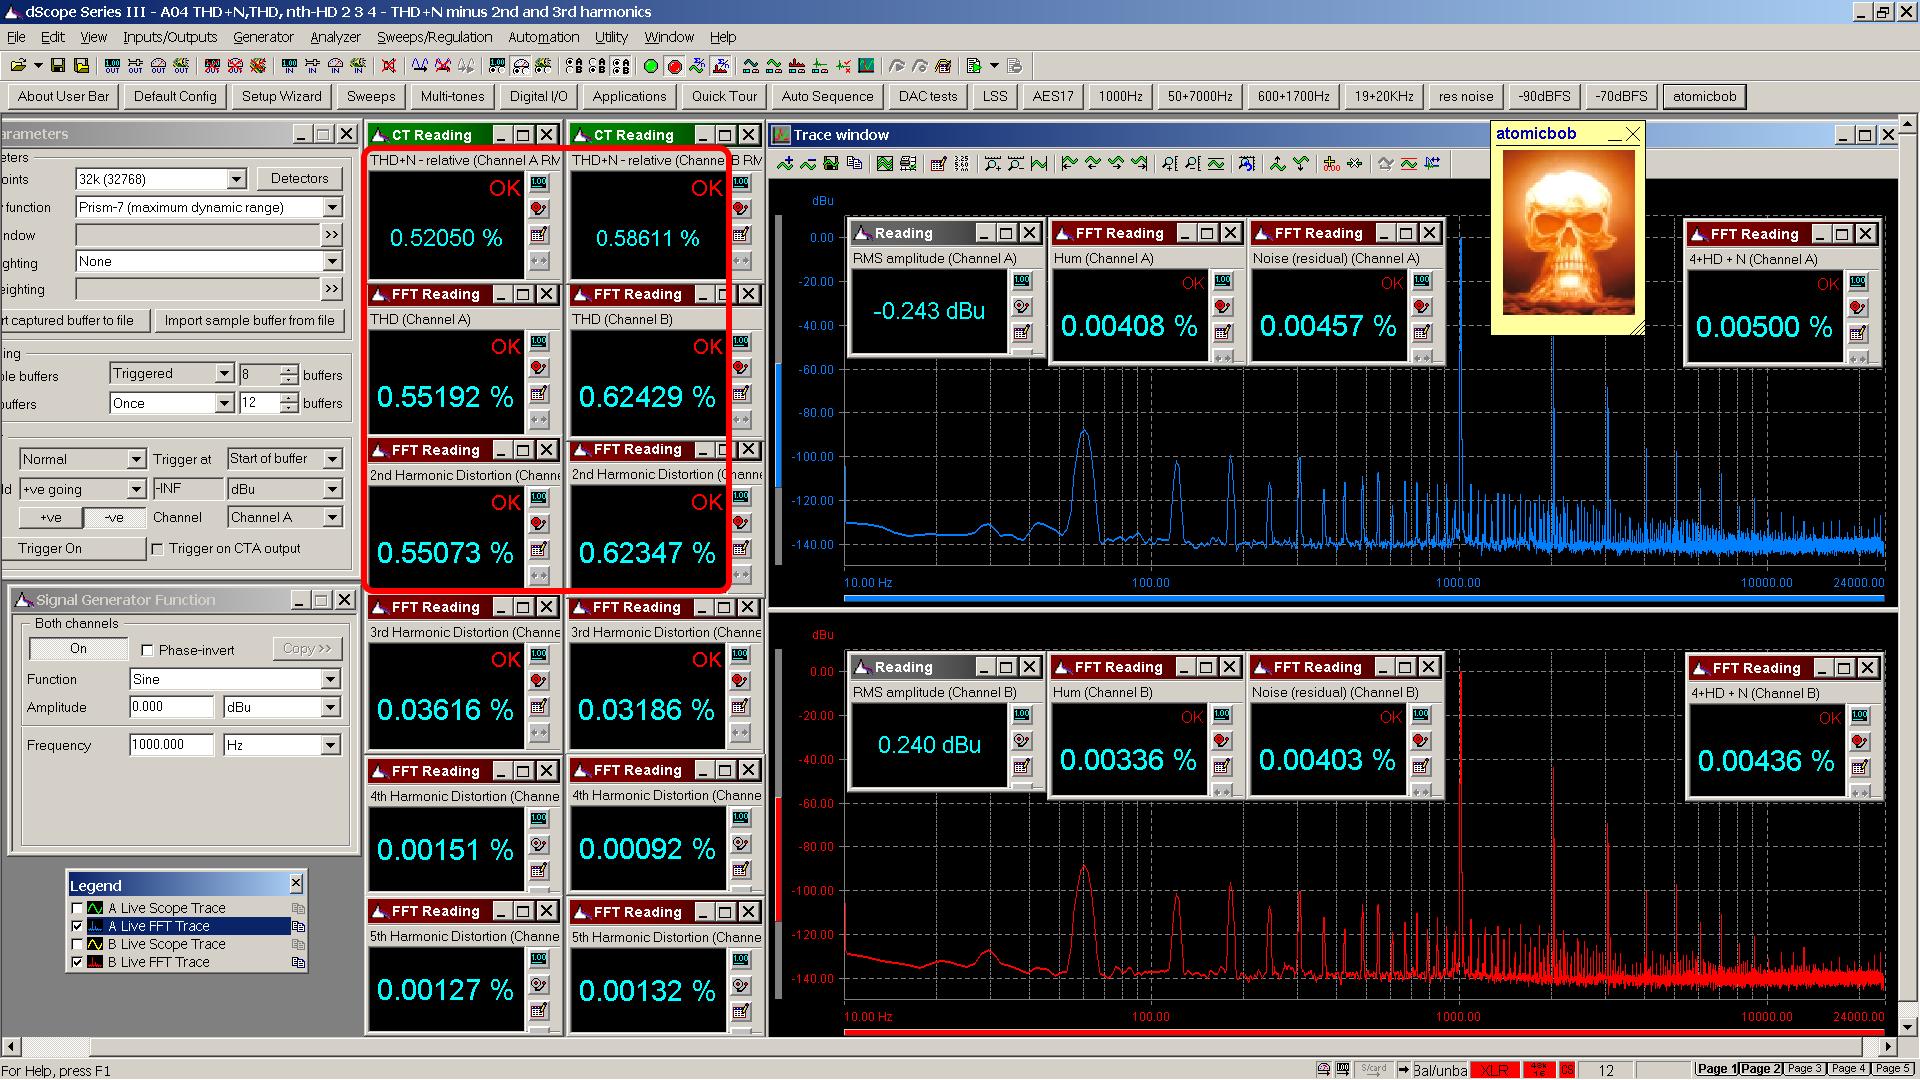 20190930-2 SW51+ 6Z51P A04 THD+N  THD  nth-HD FFT 300R HiZ - 4+HD+N with 60Hz 0dBu - THD+N THD2.png